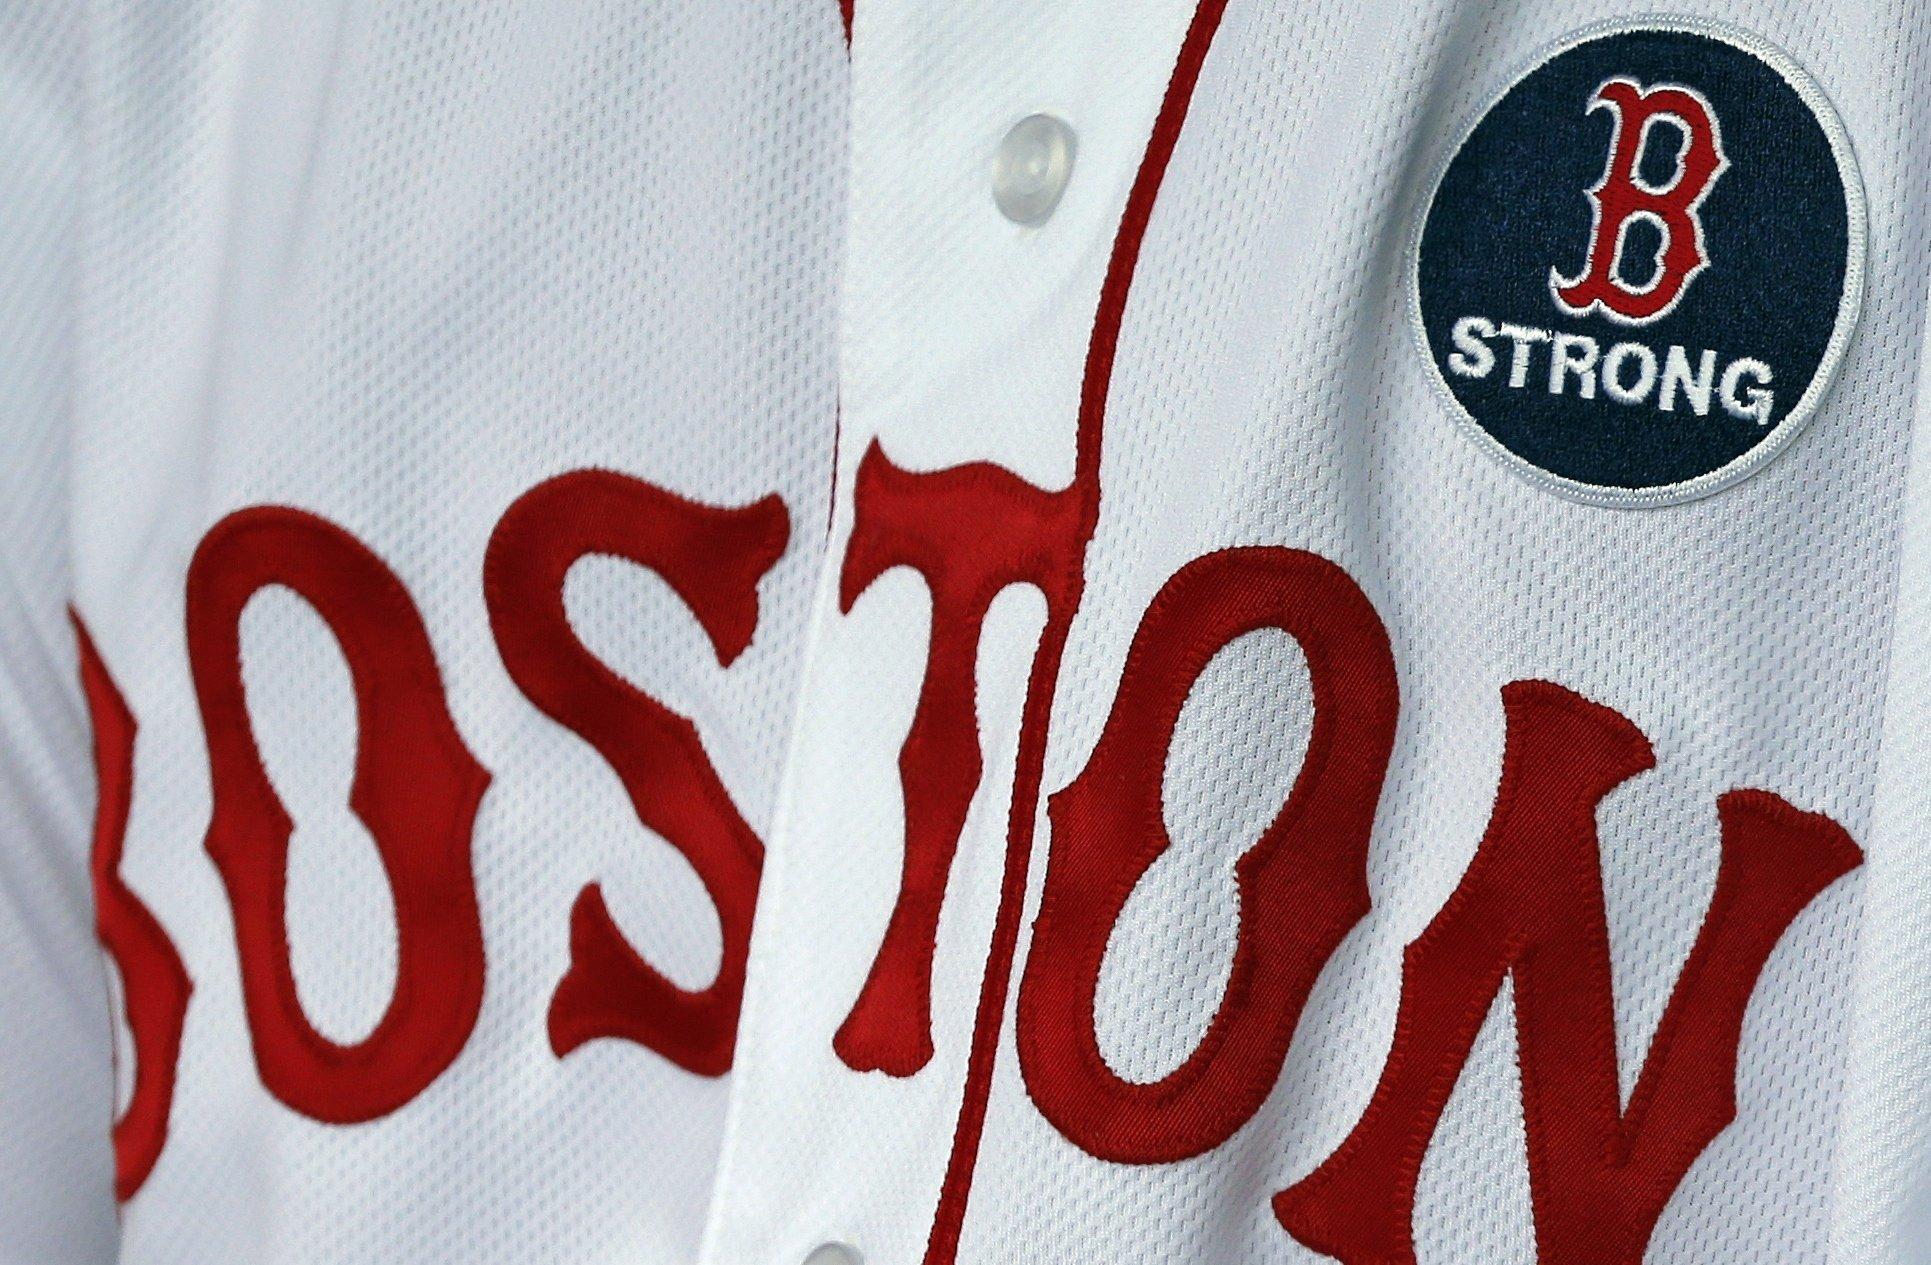 Boston Red Sox Hd Wallpaper